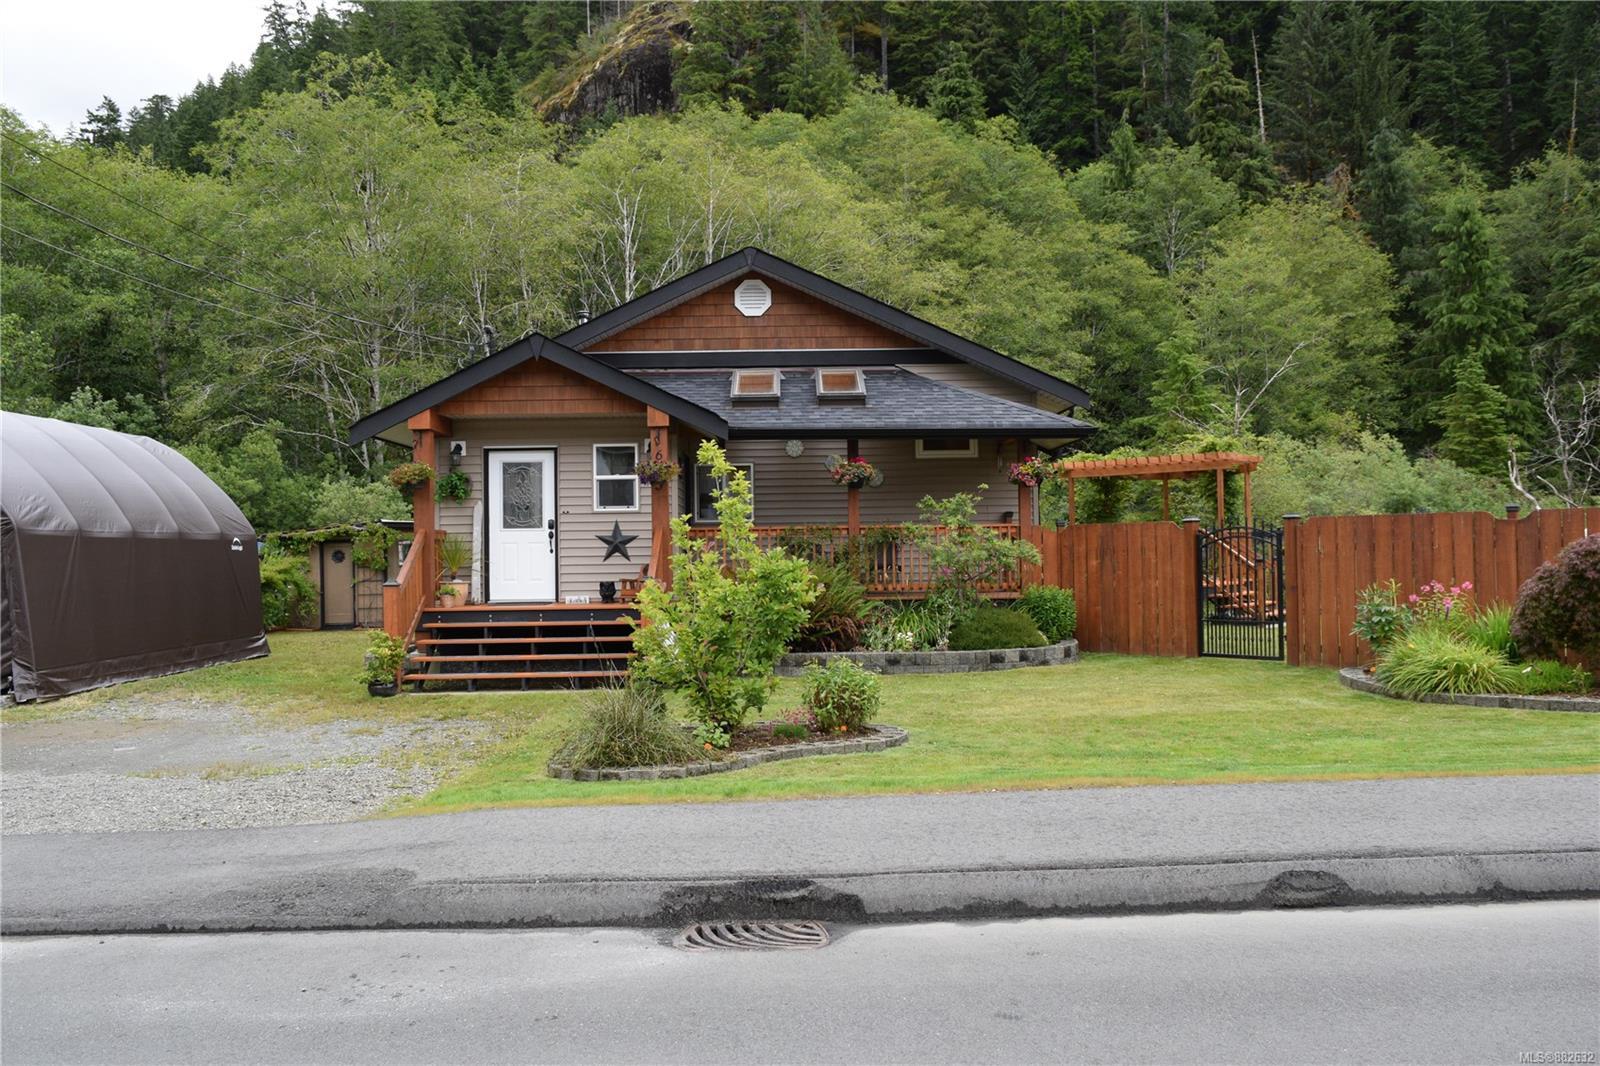 Photo 54 at 623 Alpine View Road, North Island